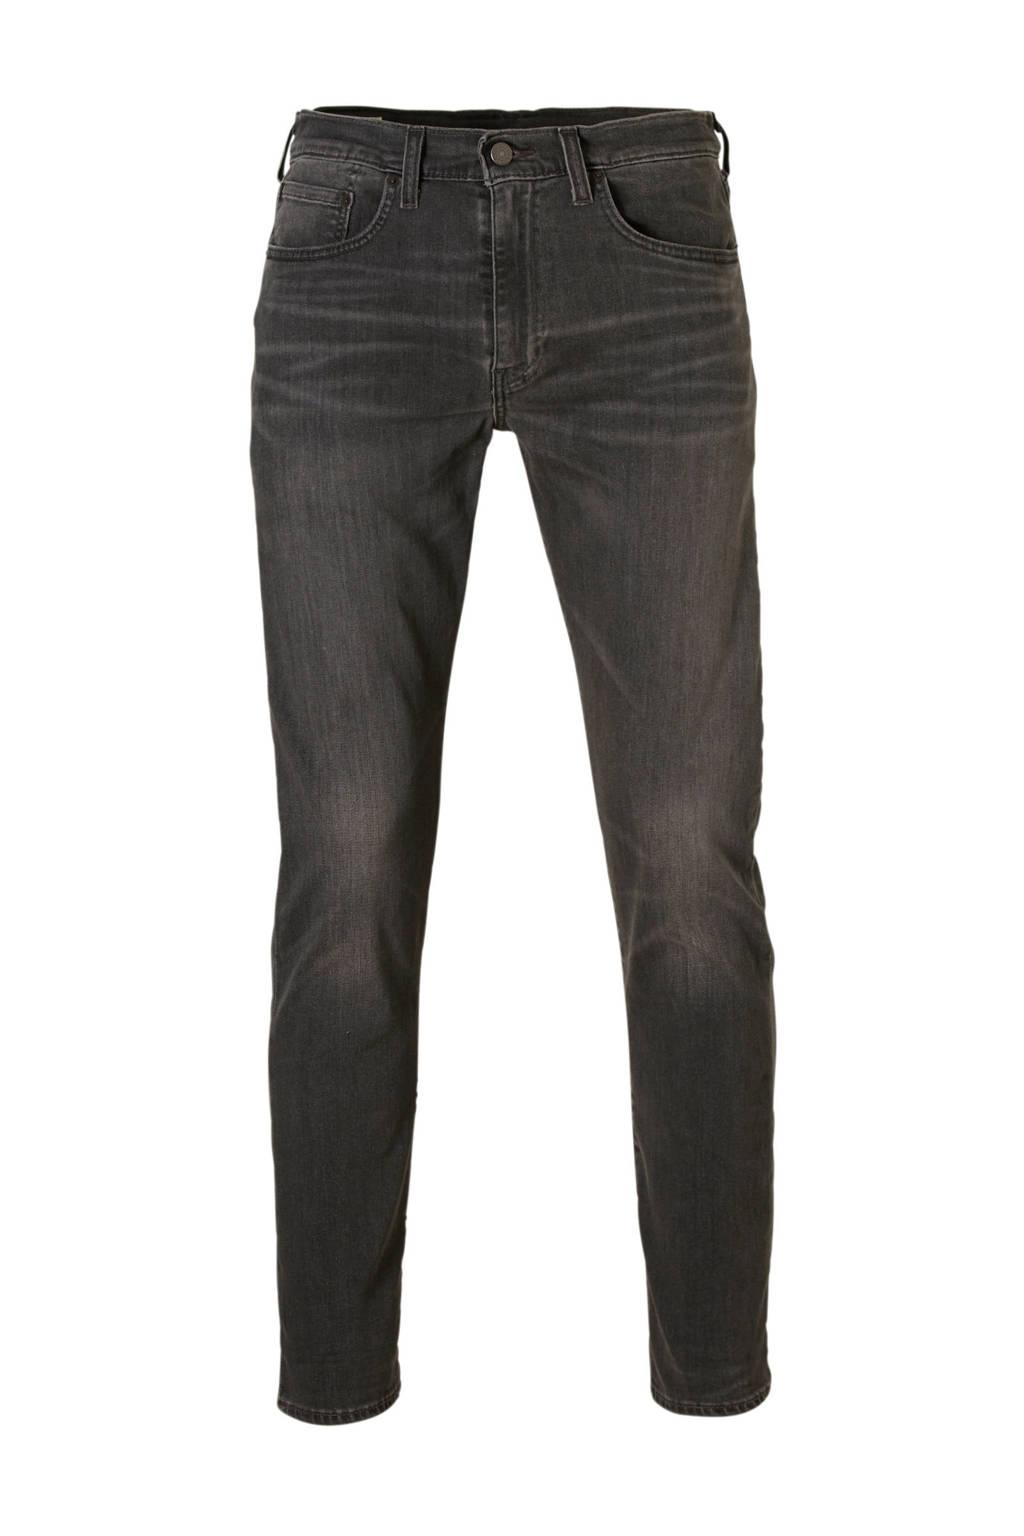 Levi's 502 taper regular fit jeans, Grijs